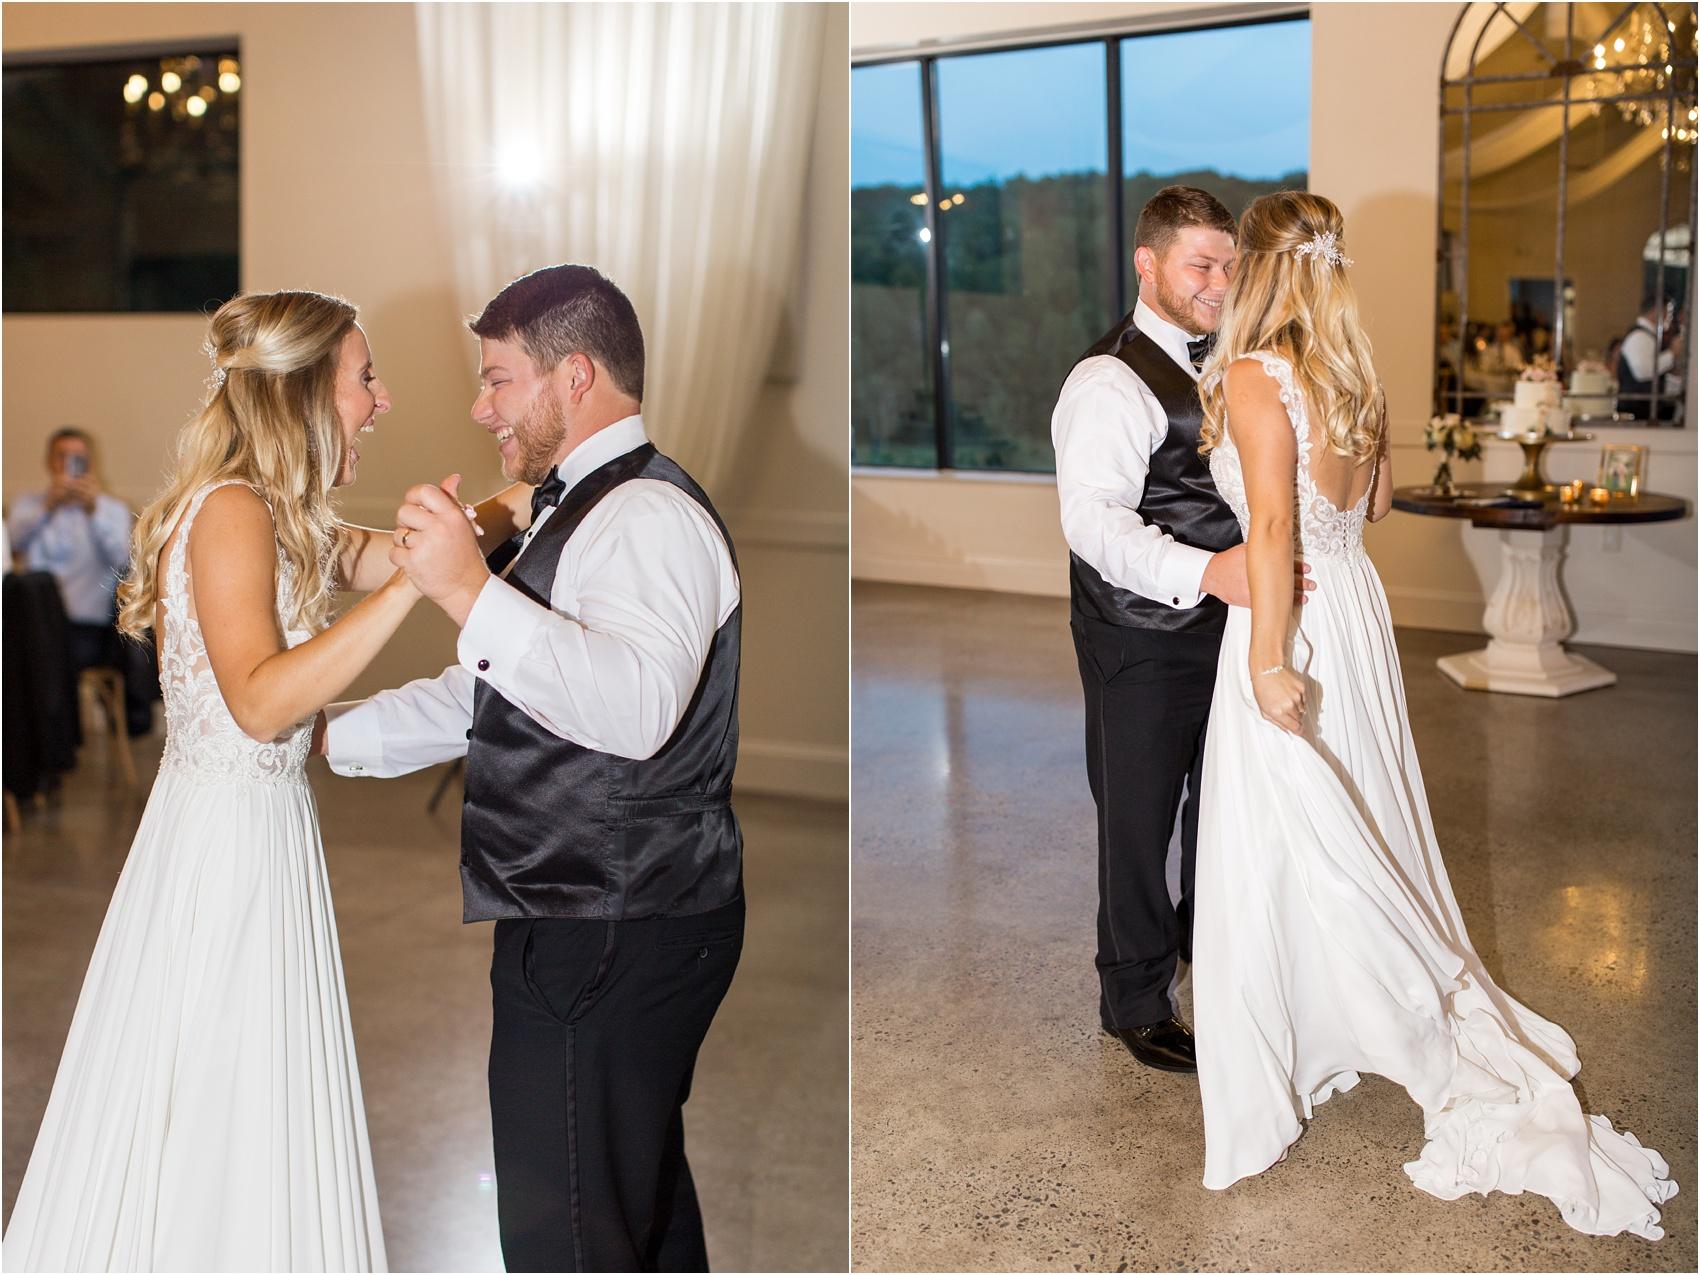 Savannah Eve Photography- Jurek-Woodworth Wedding- Sneak Peek-91.jpg